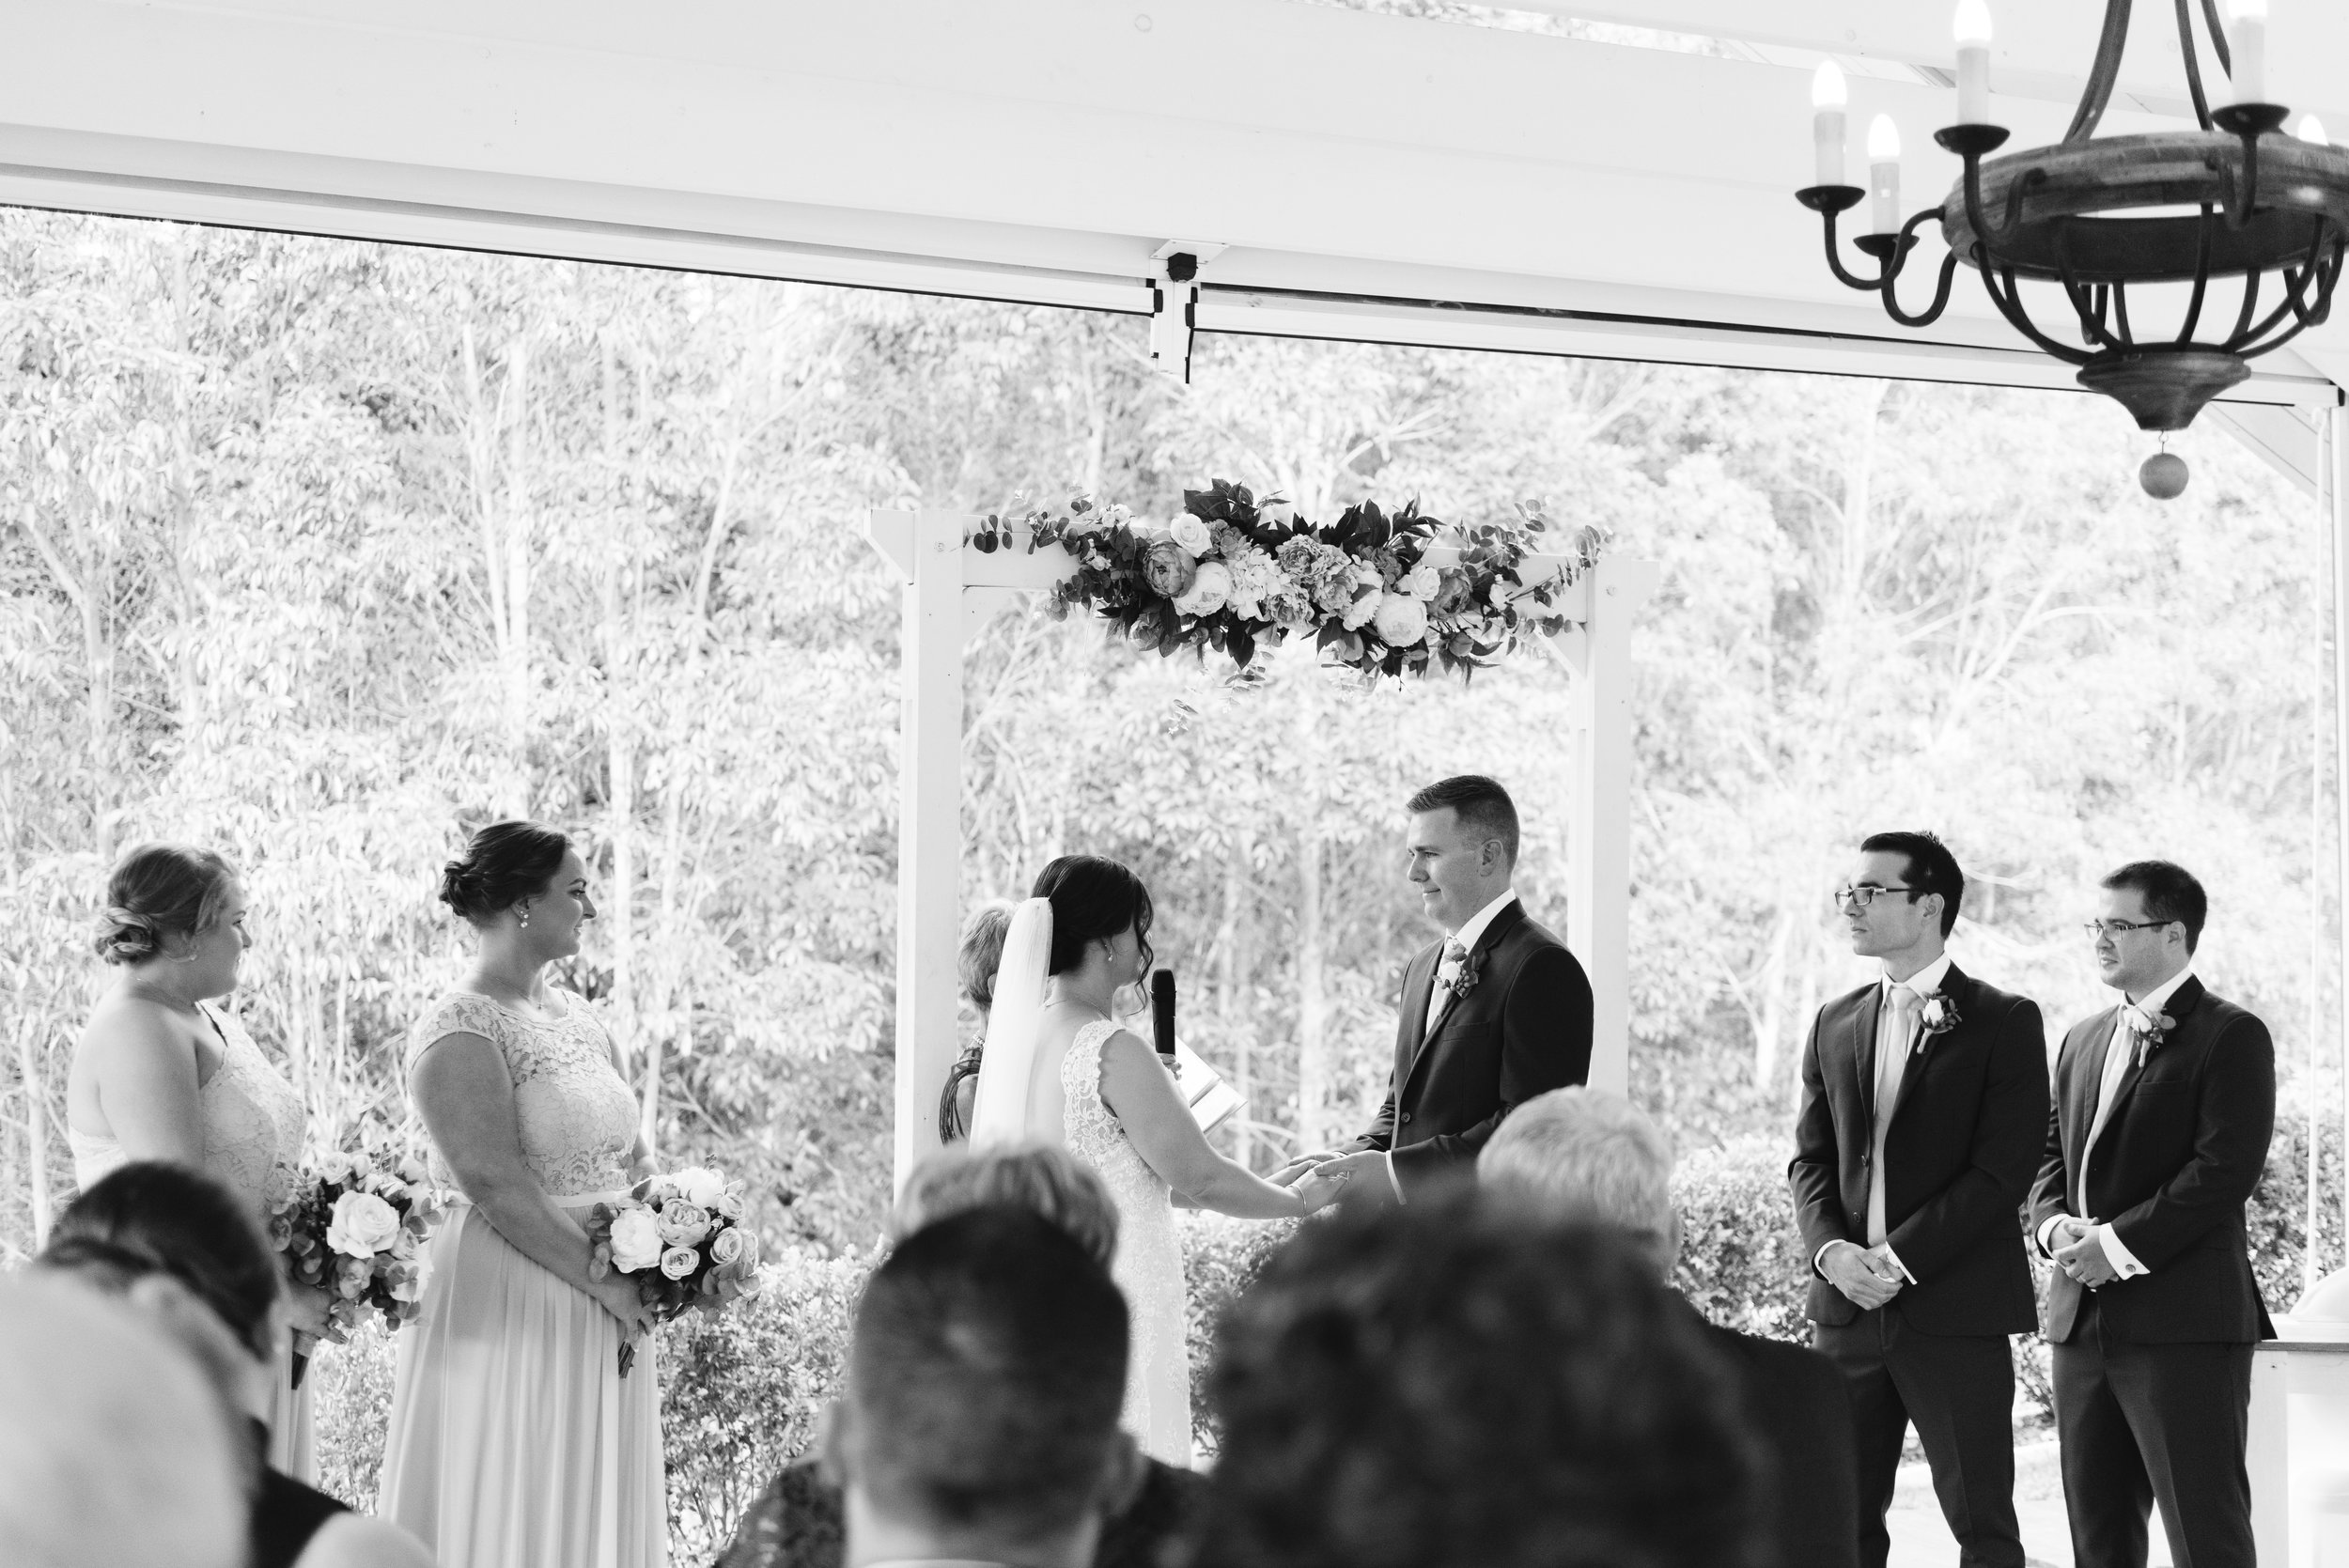 LAURENOLIVIA-austinvilla-estate-wedding-47.jpg